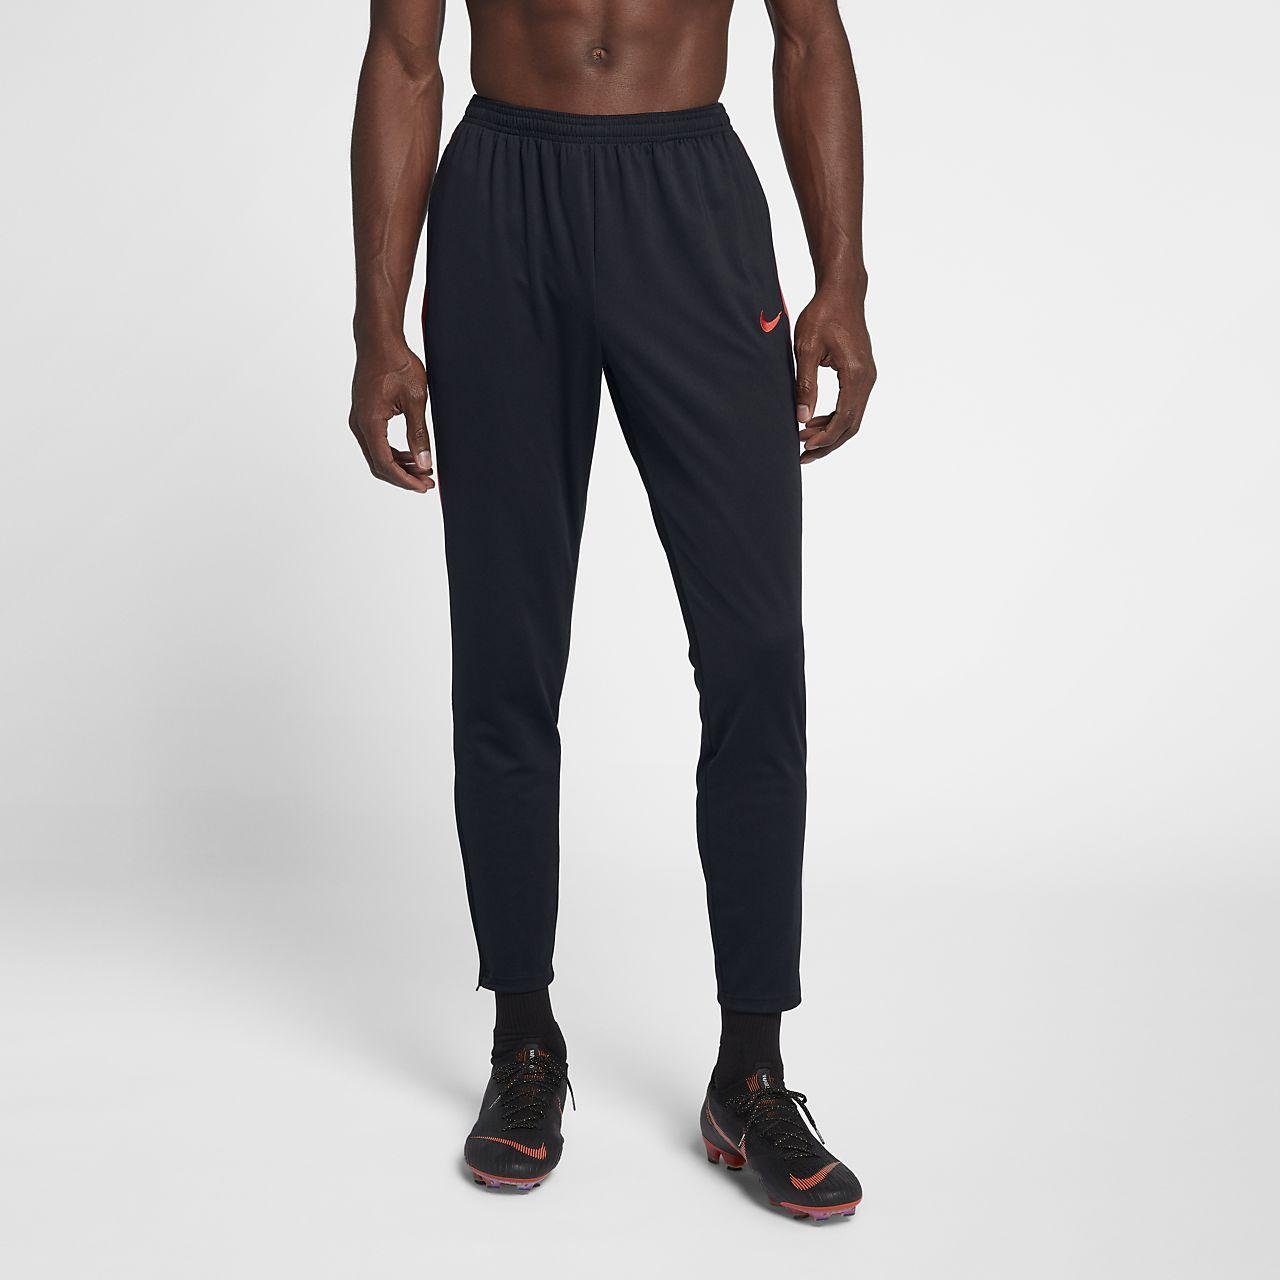 3a8770efd877 Nike Dri-FIT Academy Mens Soccer Pants